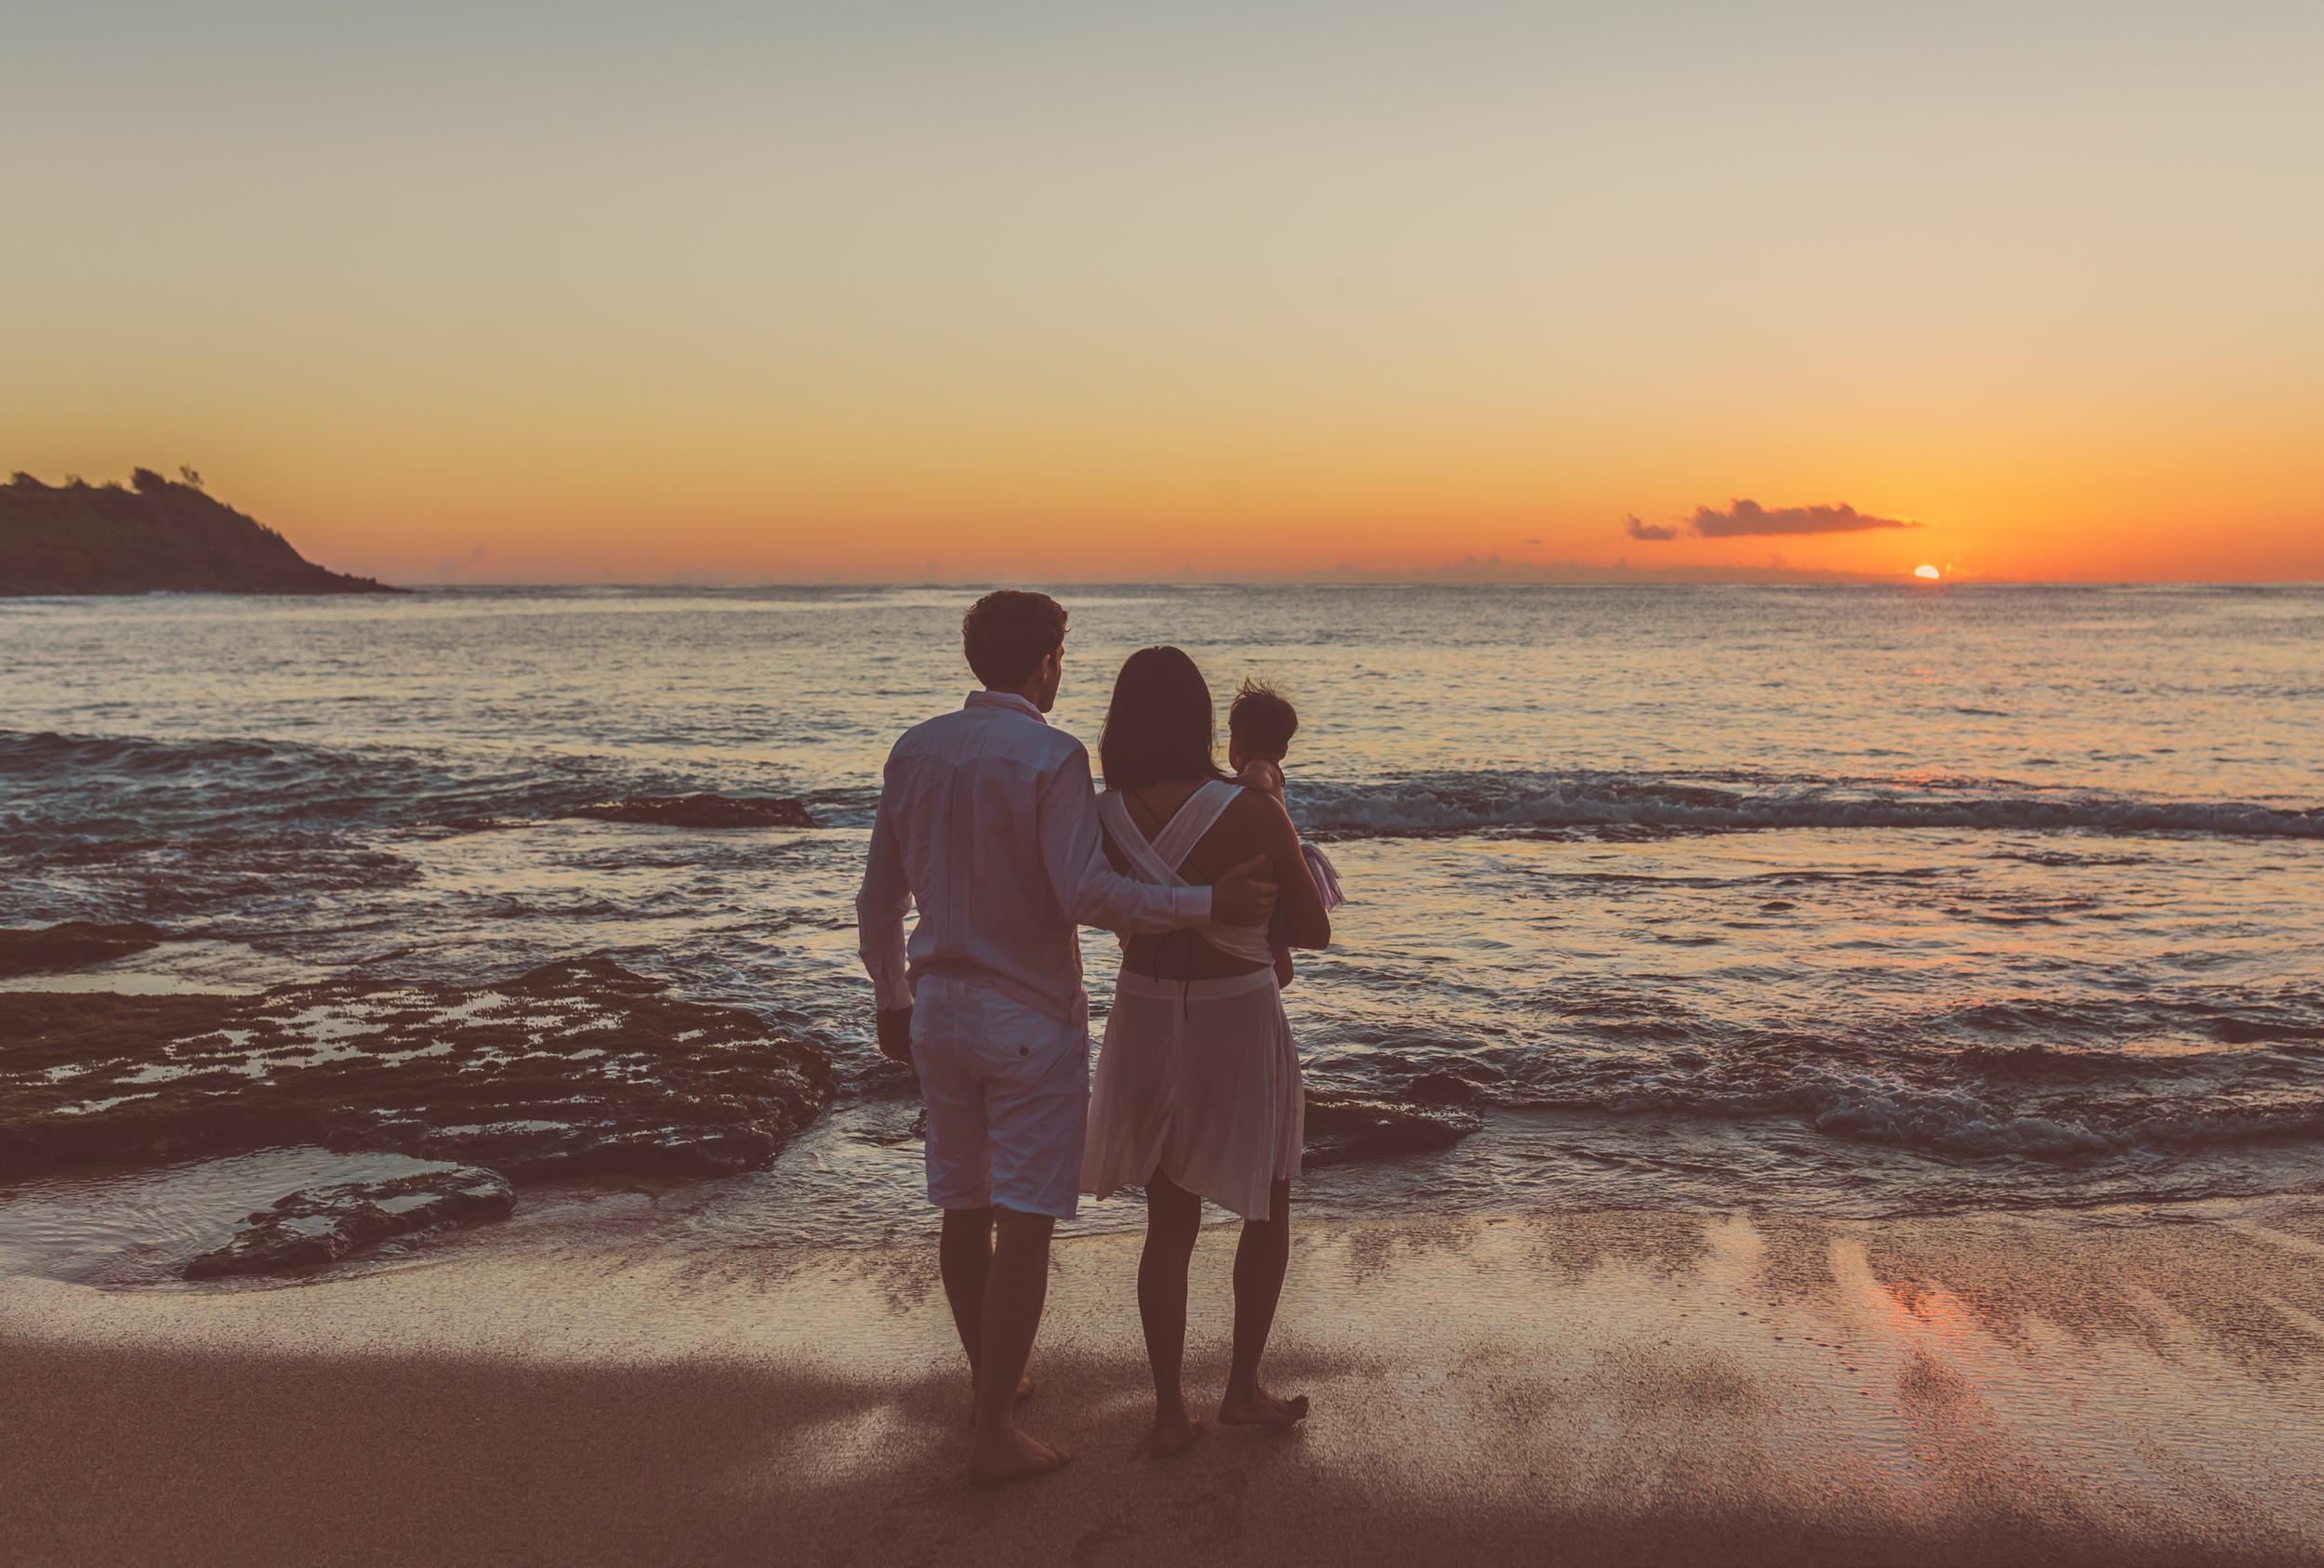 IMG_3902-SUNRISE-FAMILY-PHOTOS-KAUAI-HAWAII-JENNIFER-PICARD-PHOTOGRAPHY-WEB.jpg